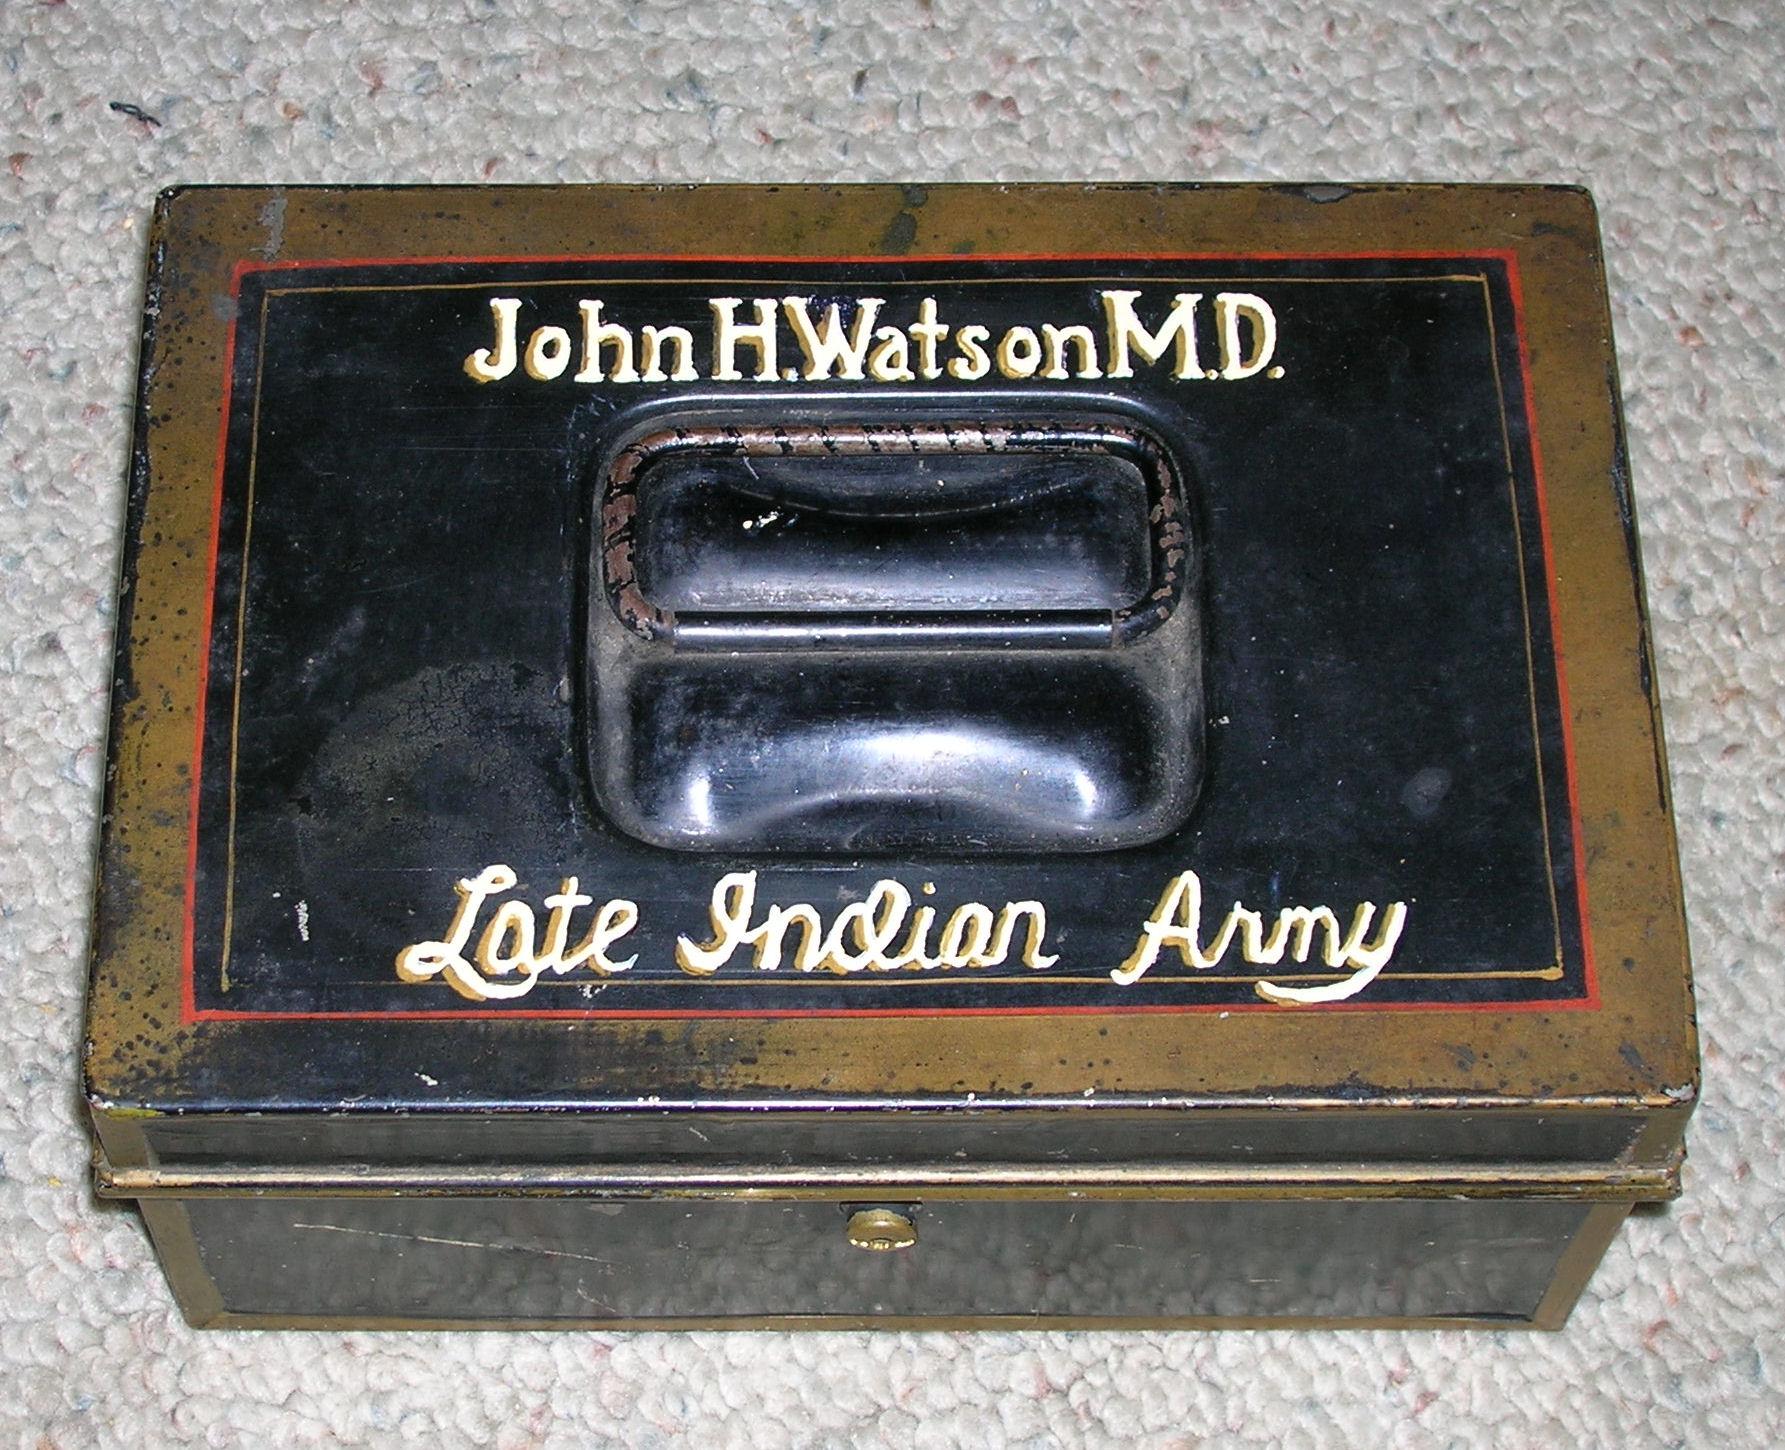 From Watson's Tin Box: Lady Frances Carfax